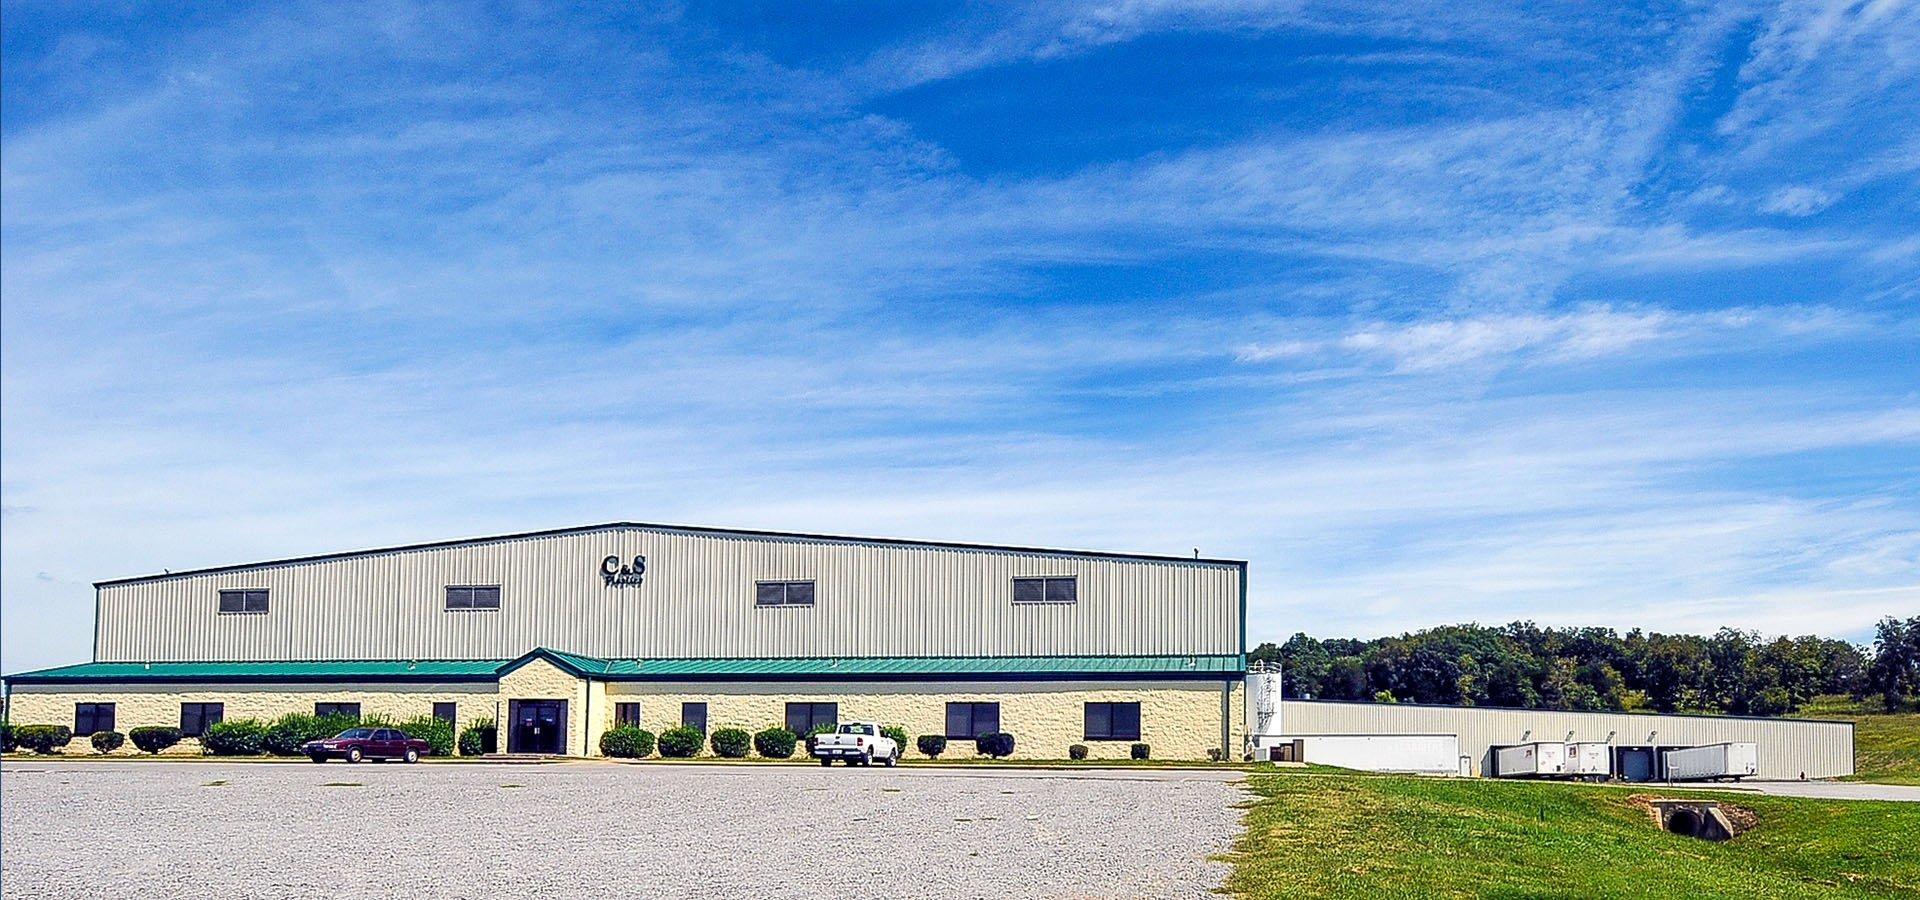 C&S Plastics | Fayetteville, Tennessee | Brindley Construction, LLC.